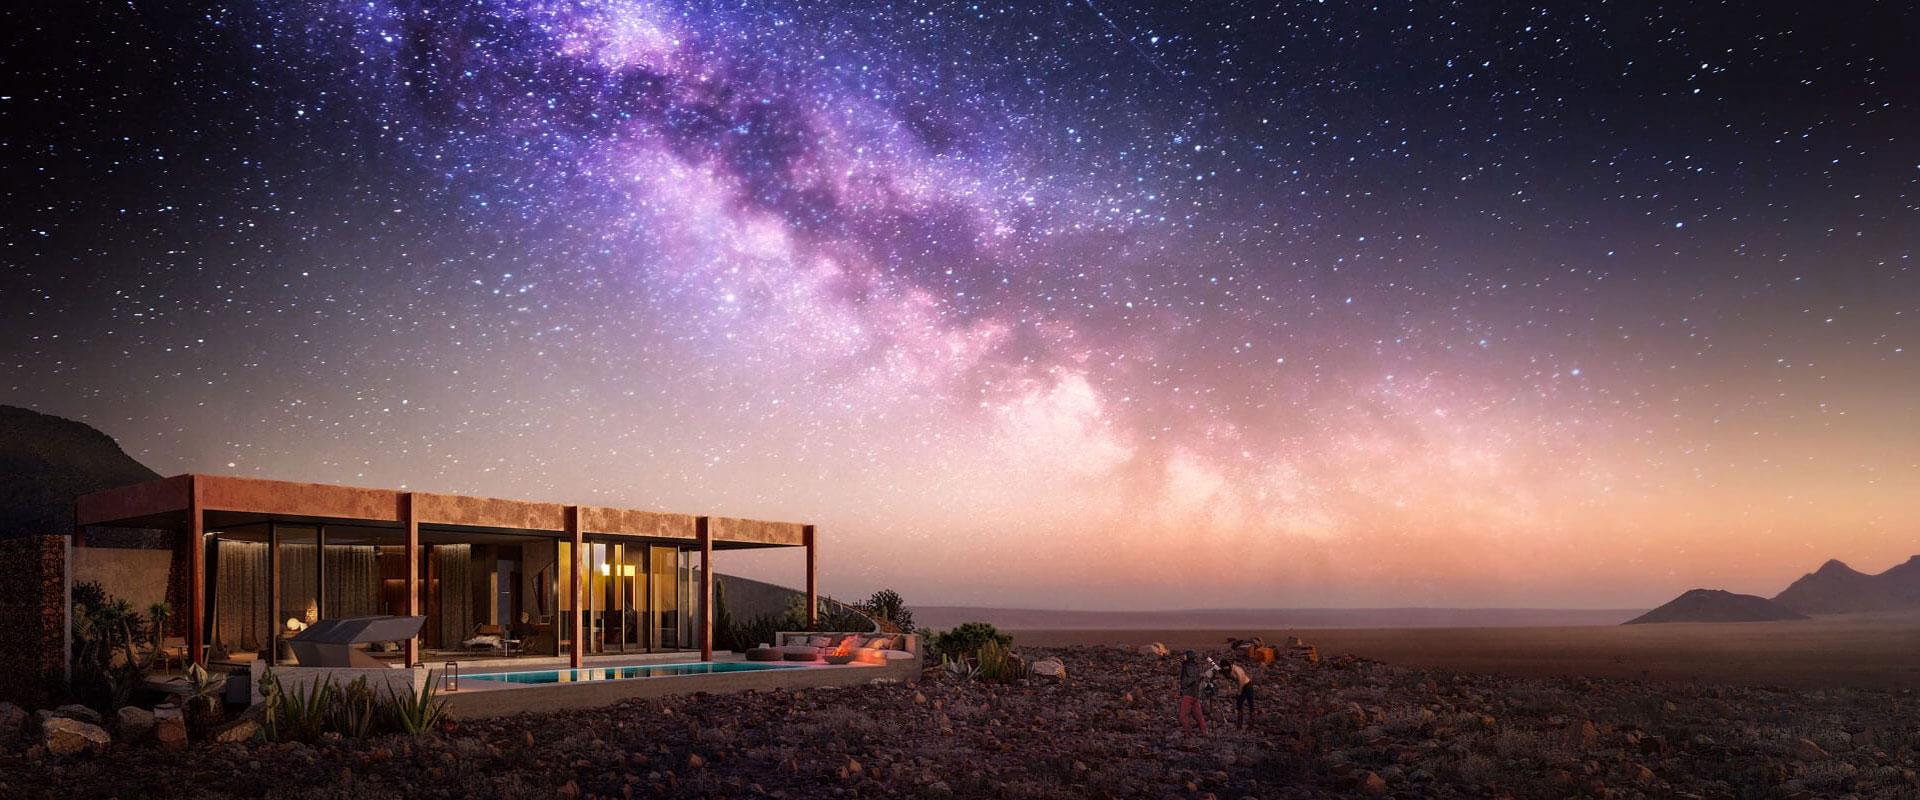 Namibia - The Luxury Safari Company